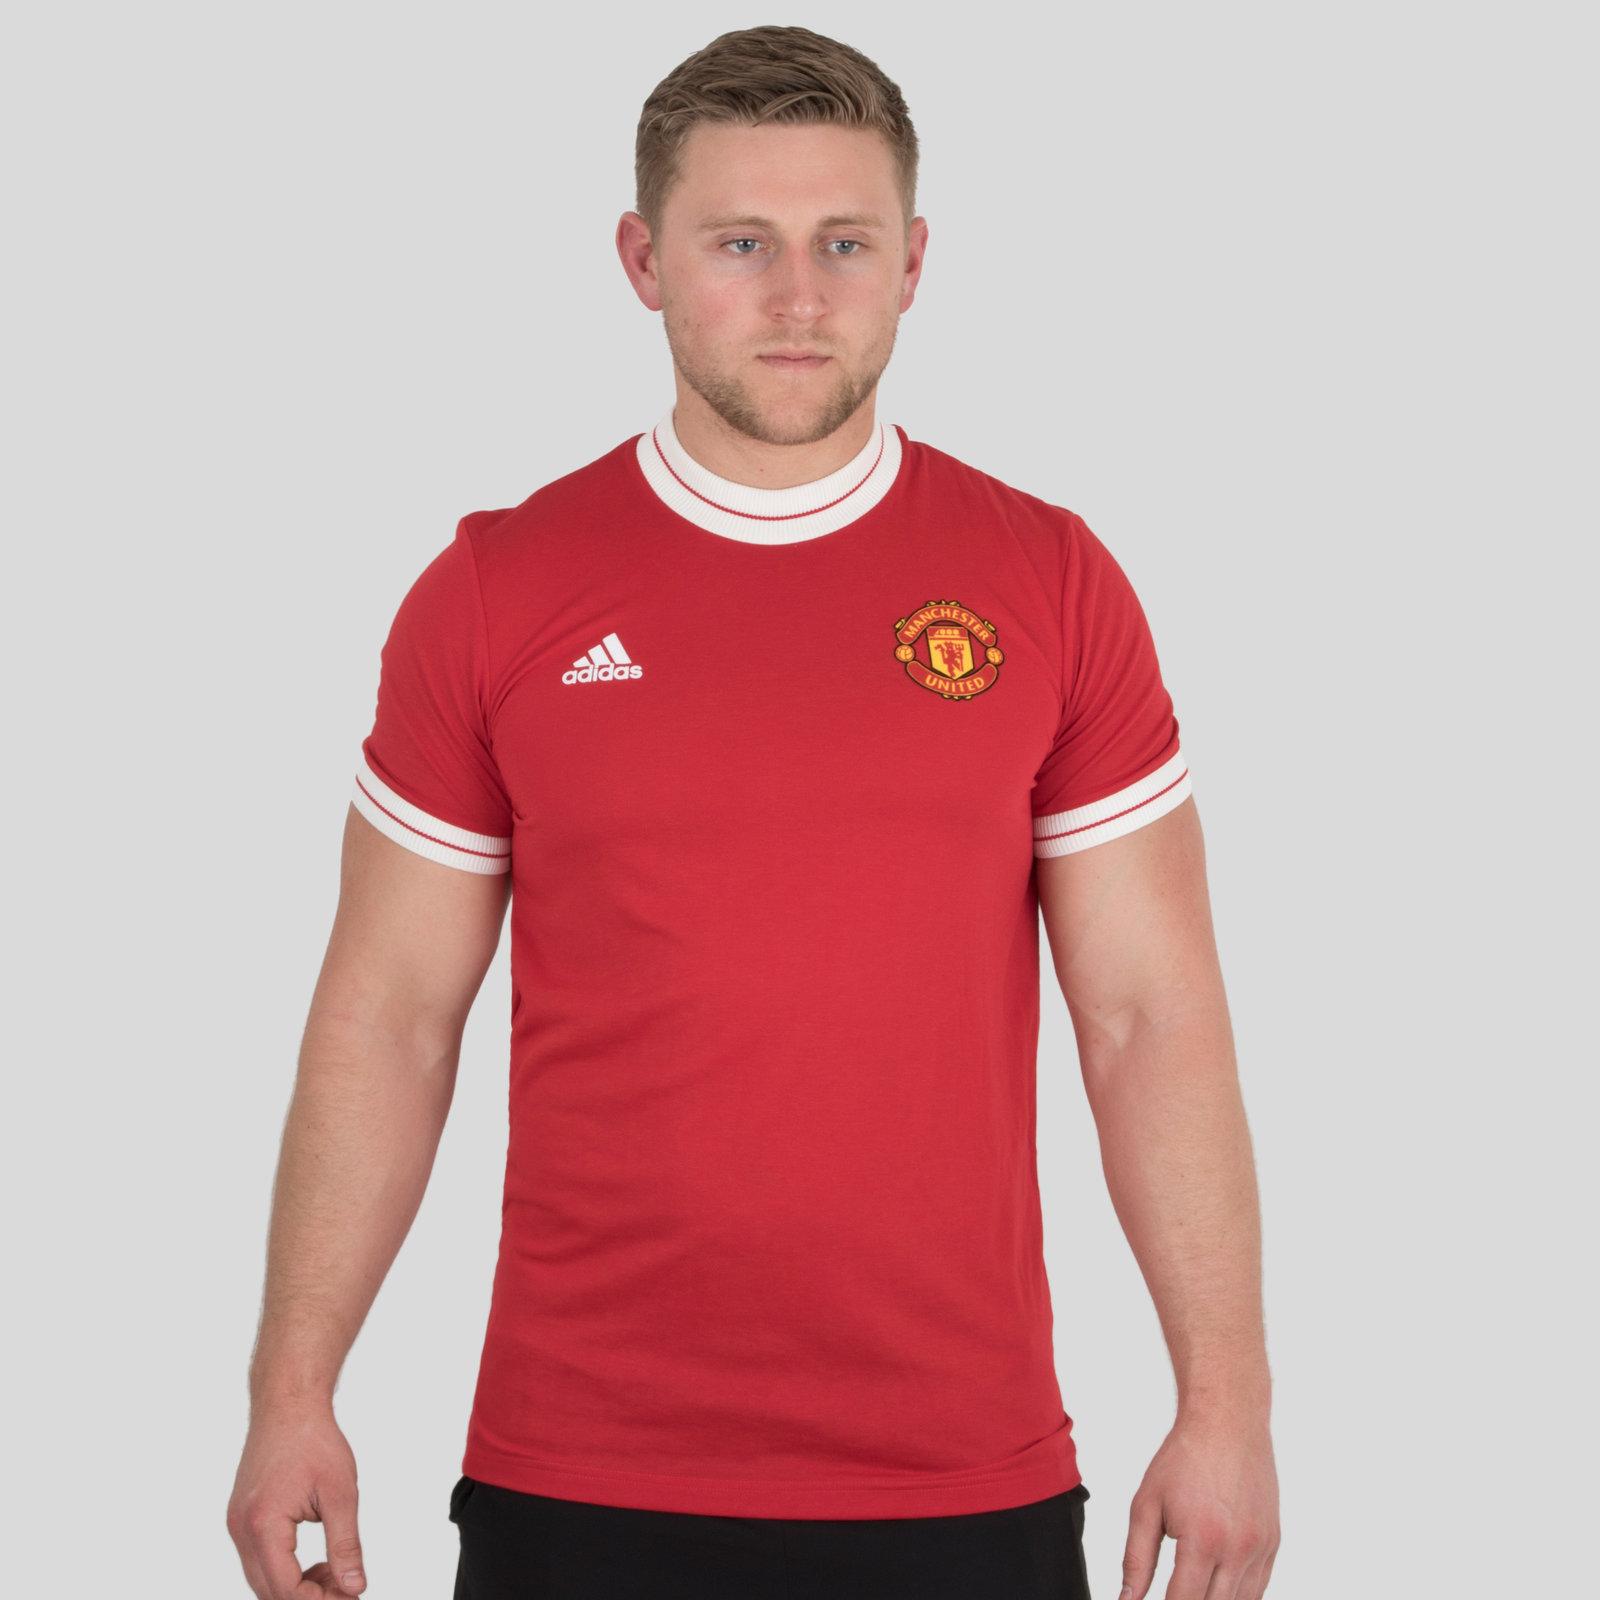 Manchester United Icon OM 93 Retro Football Shirt